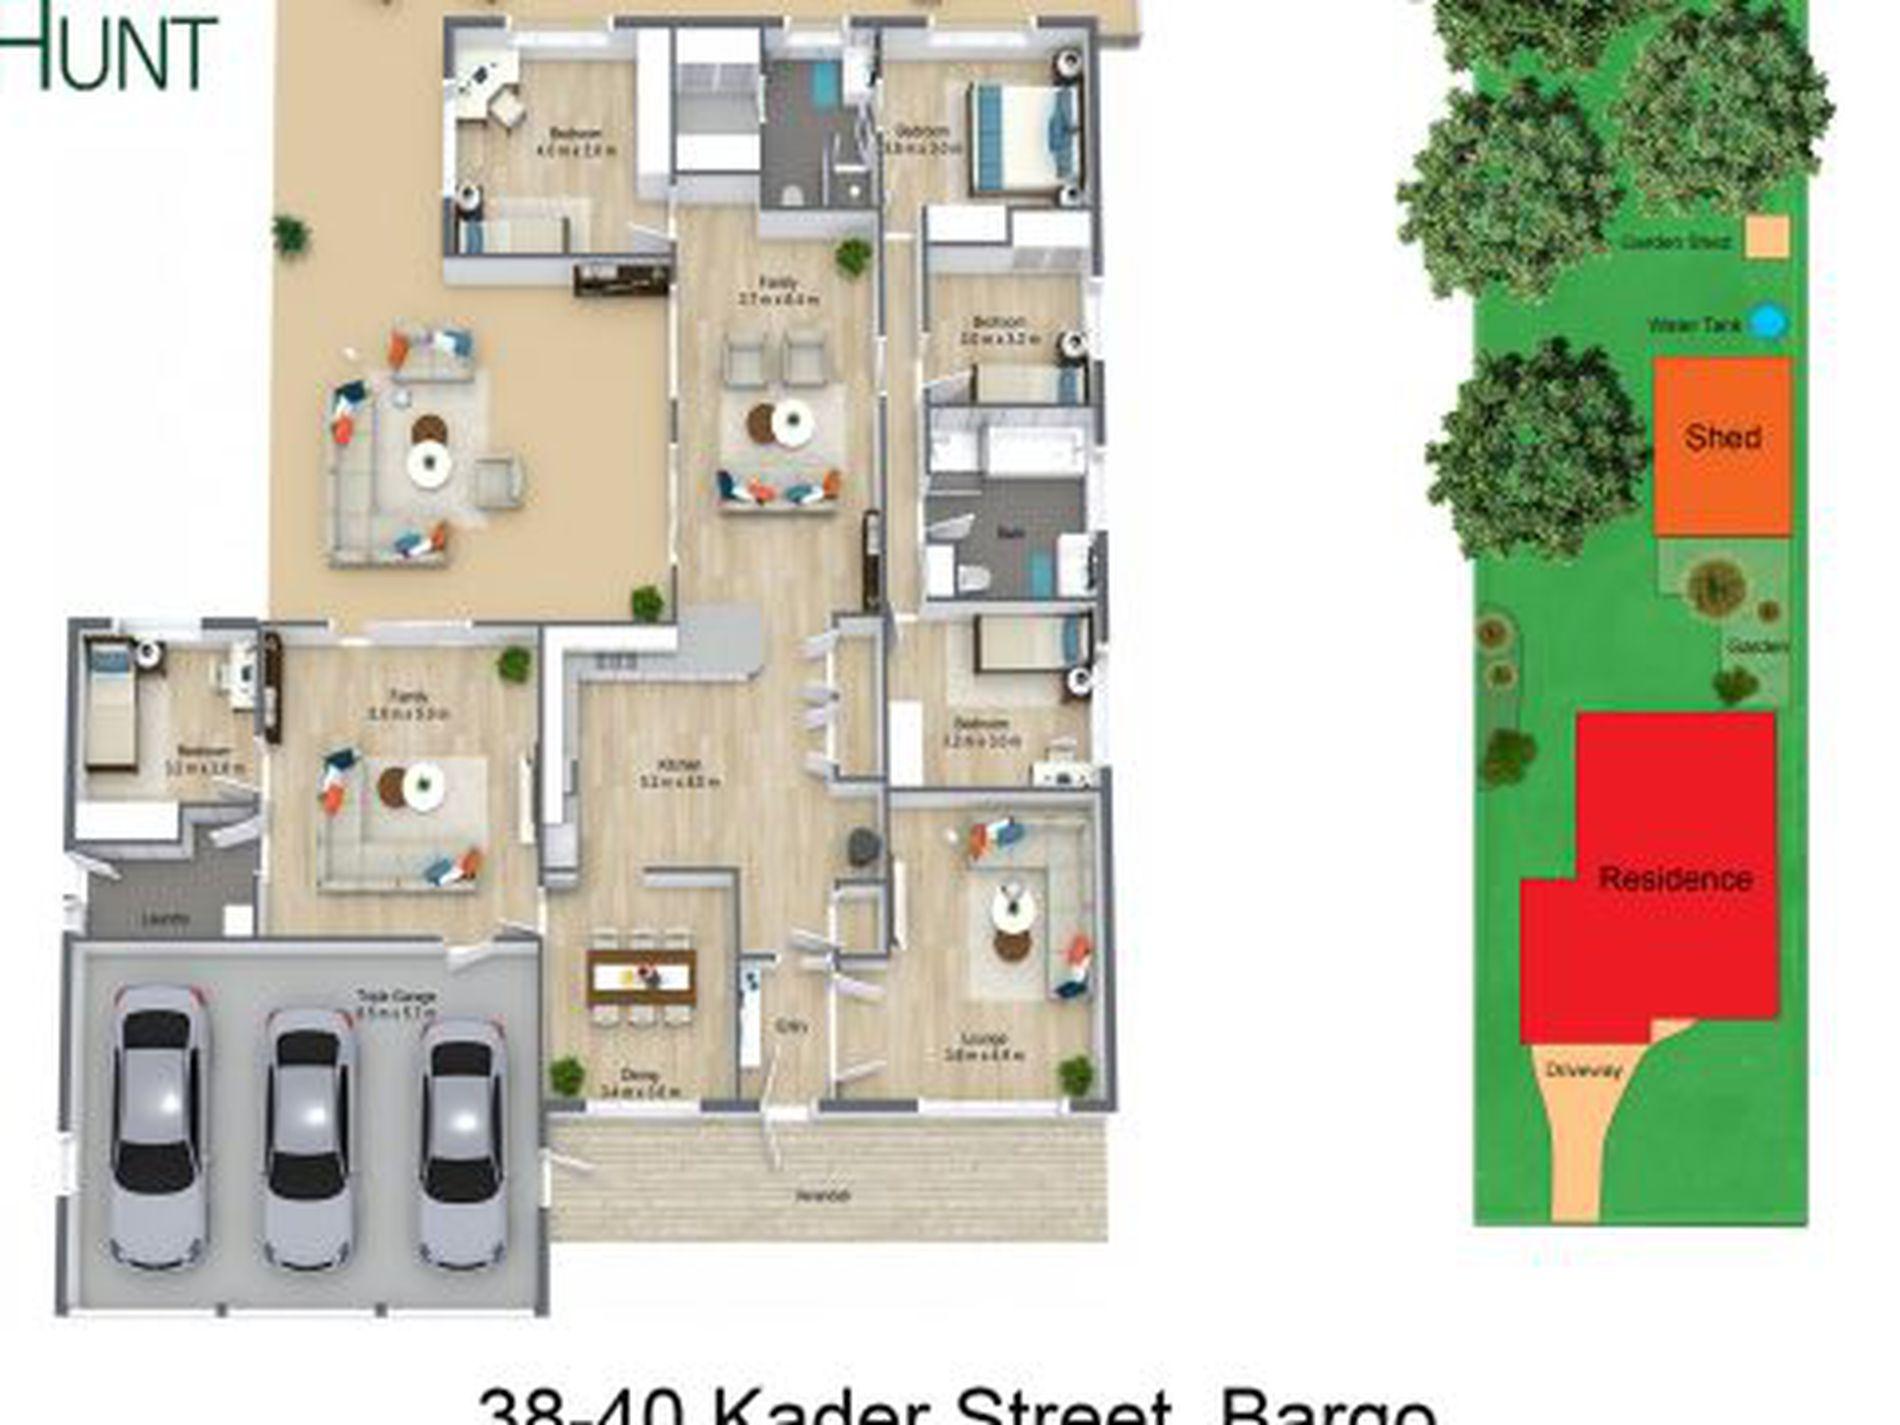 38-40 Kader Street, Bargo